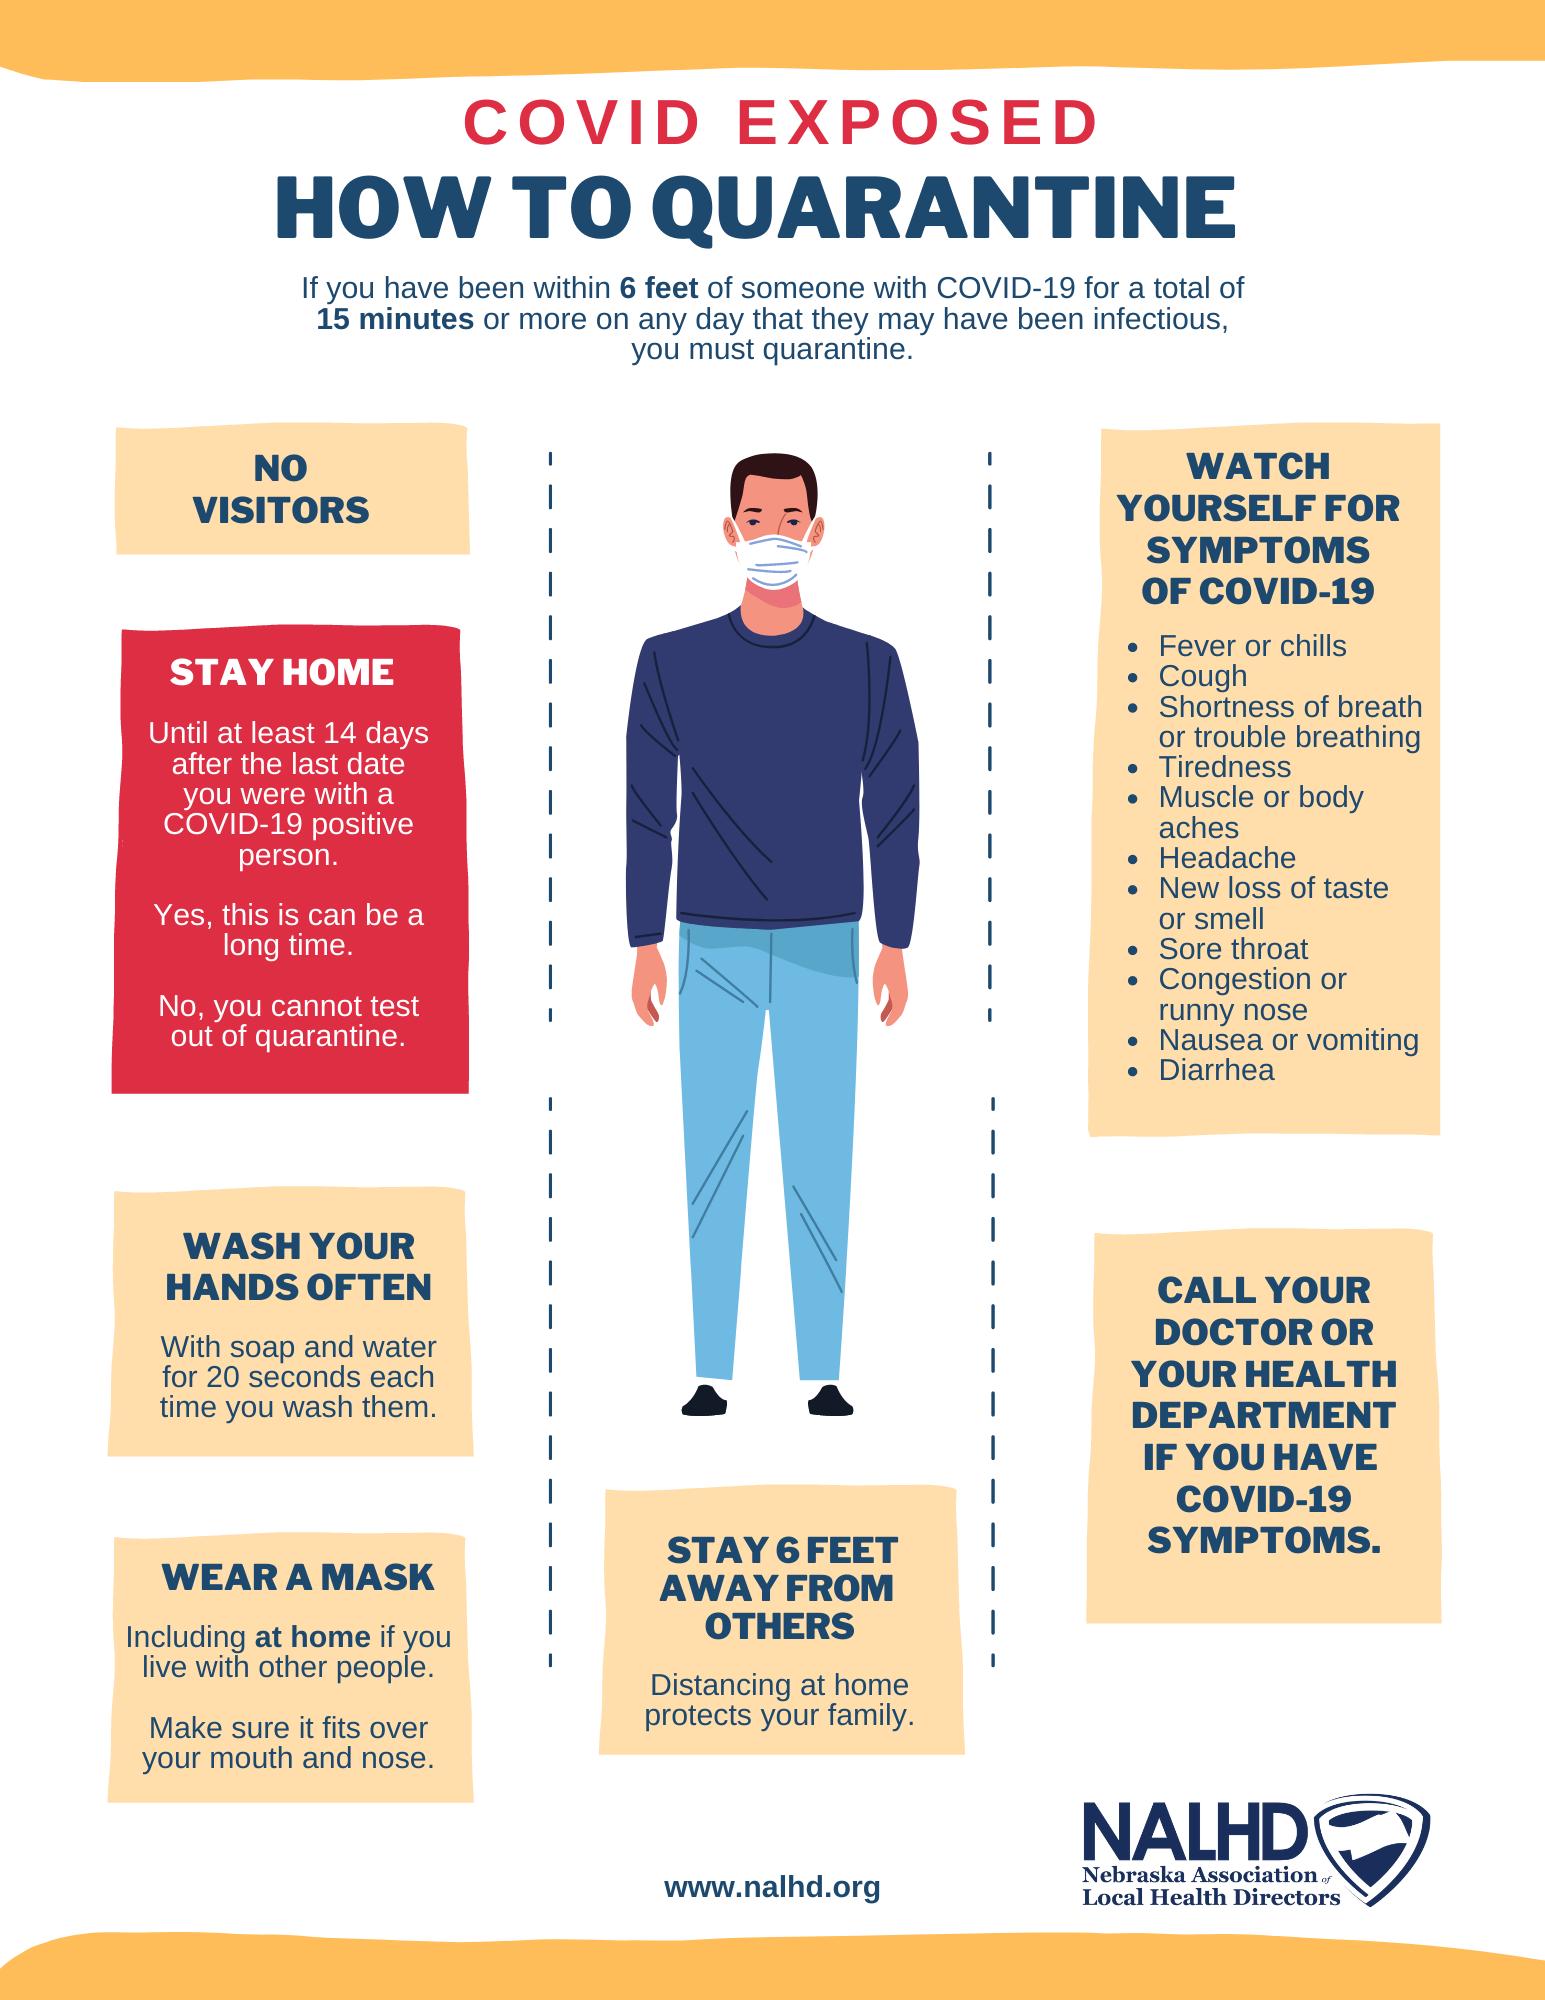 How to Quarantine